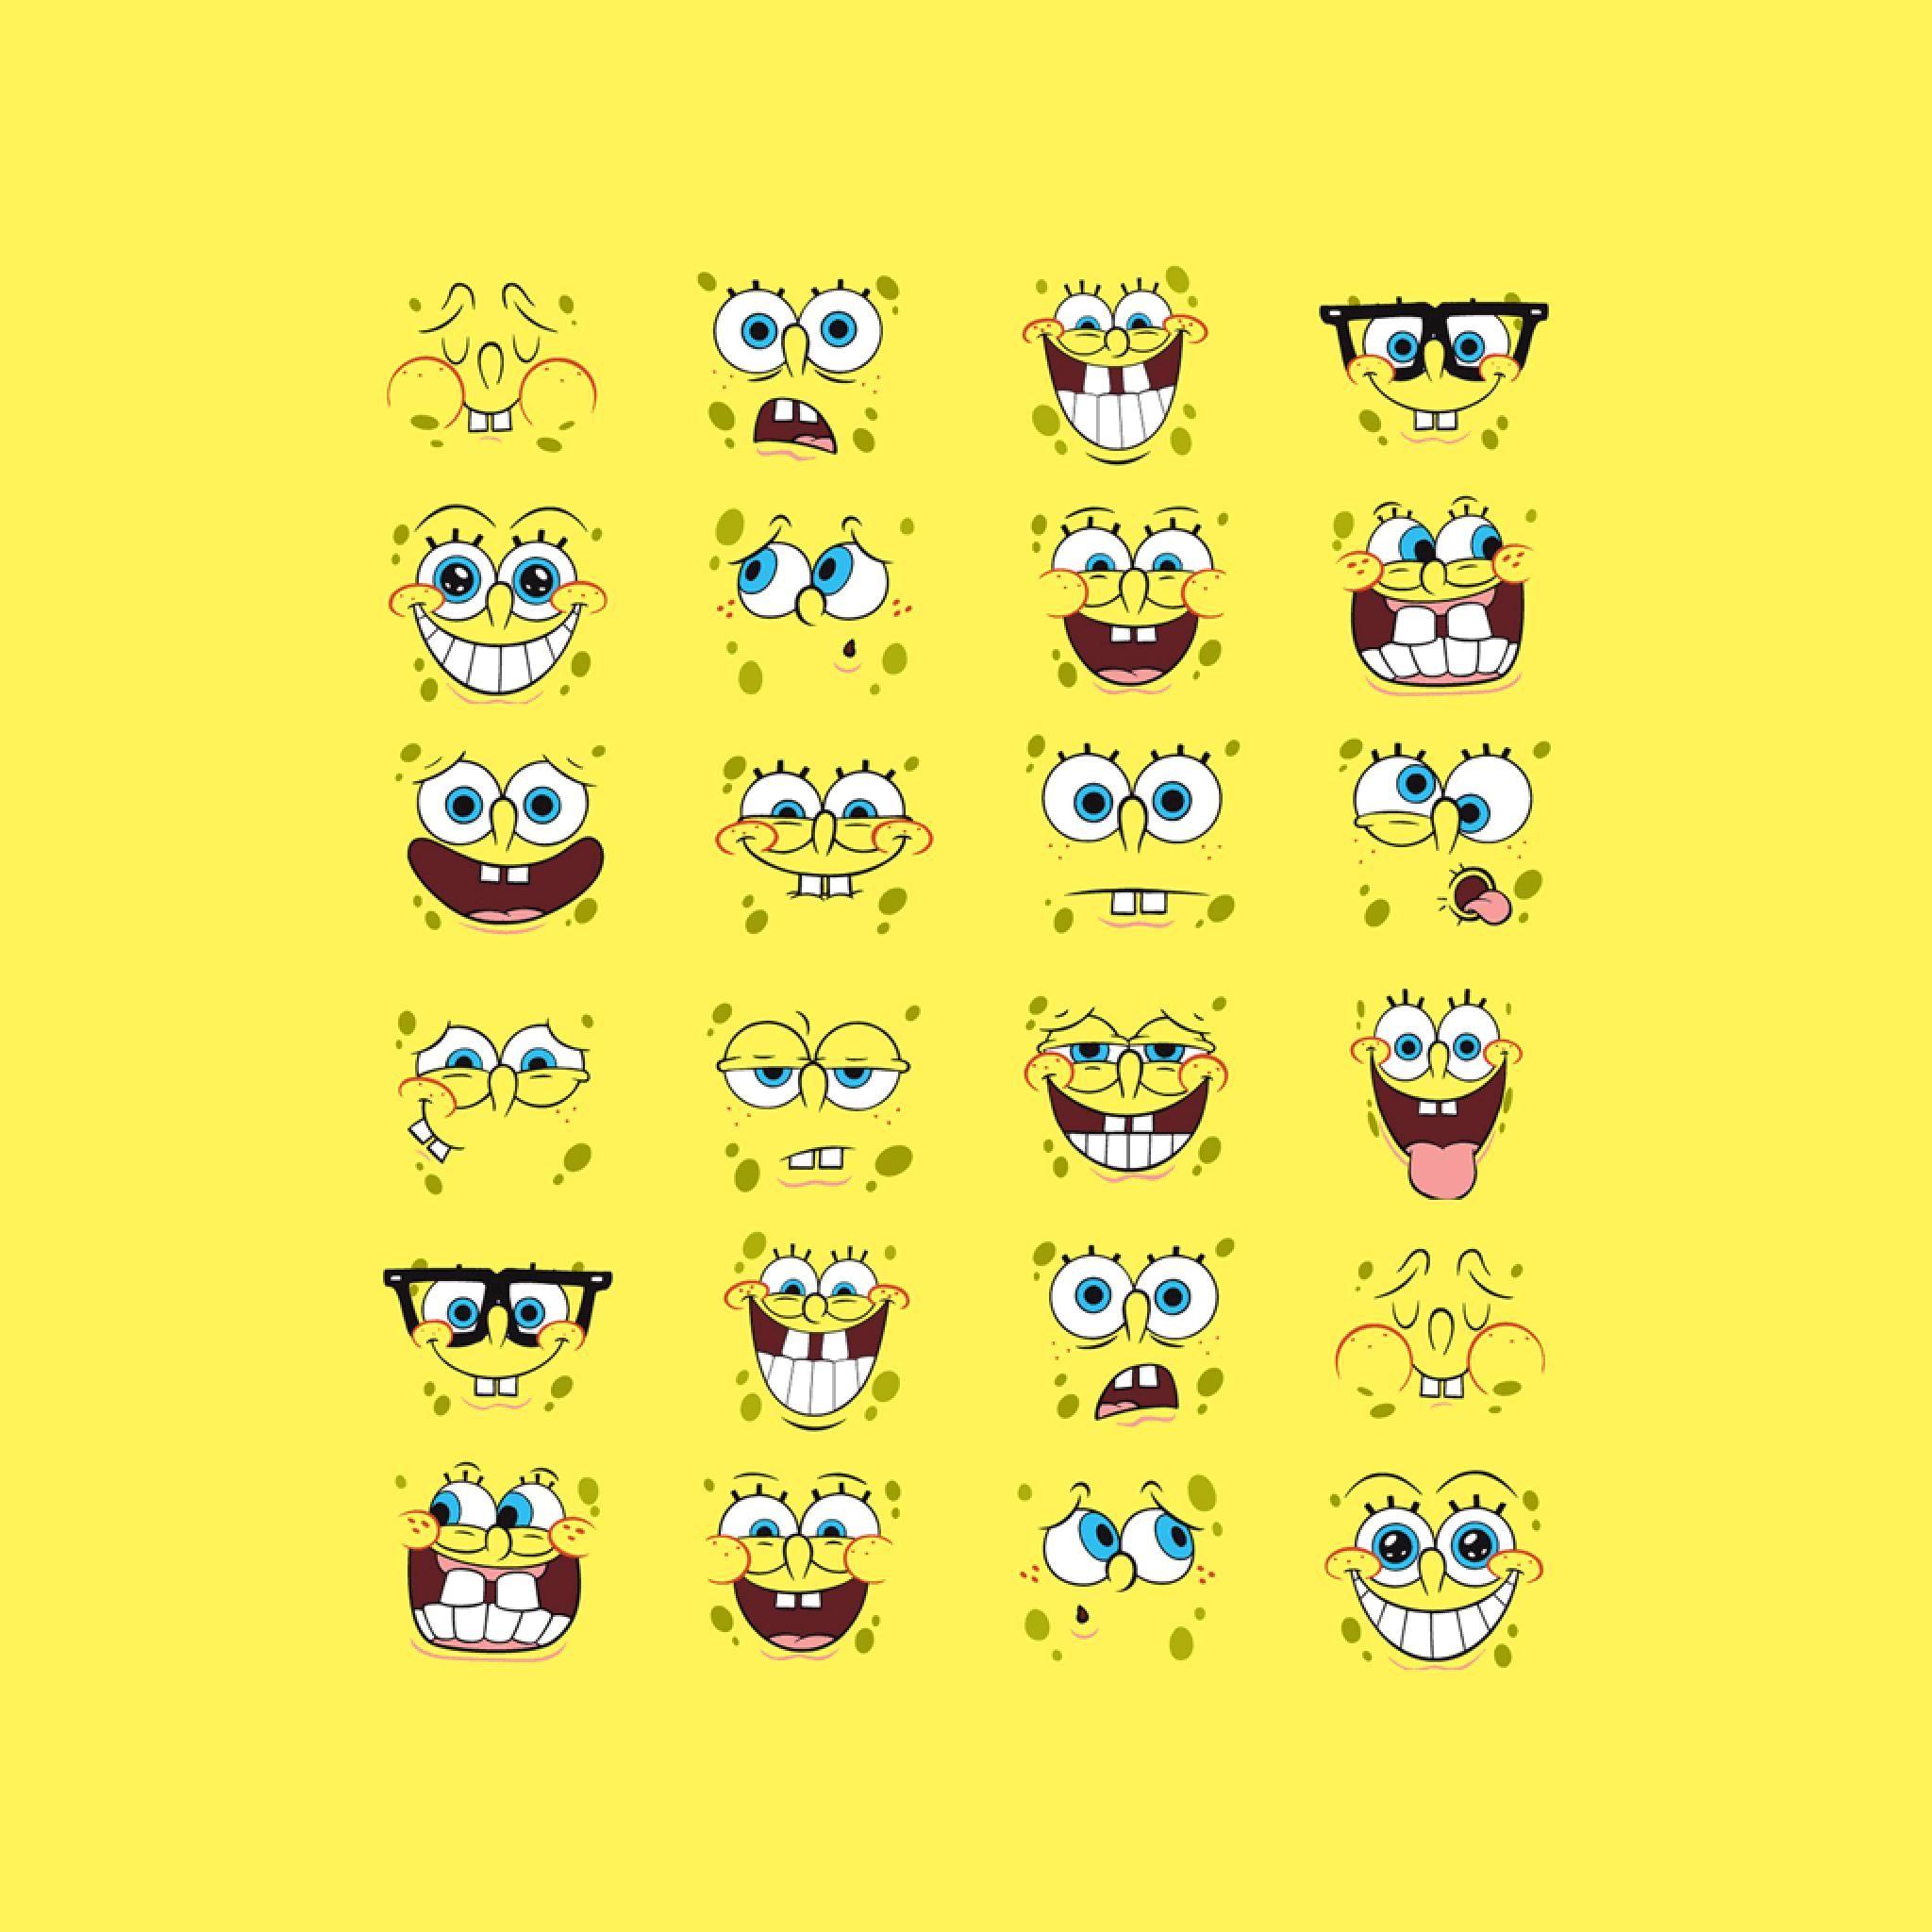 Spongebob Squarepants Emotions